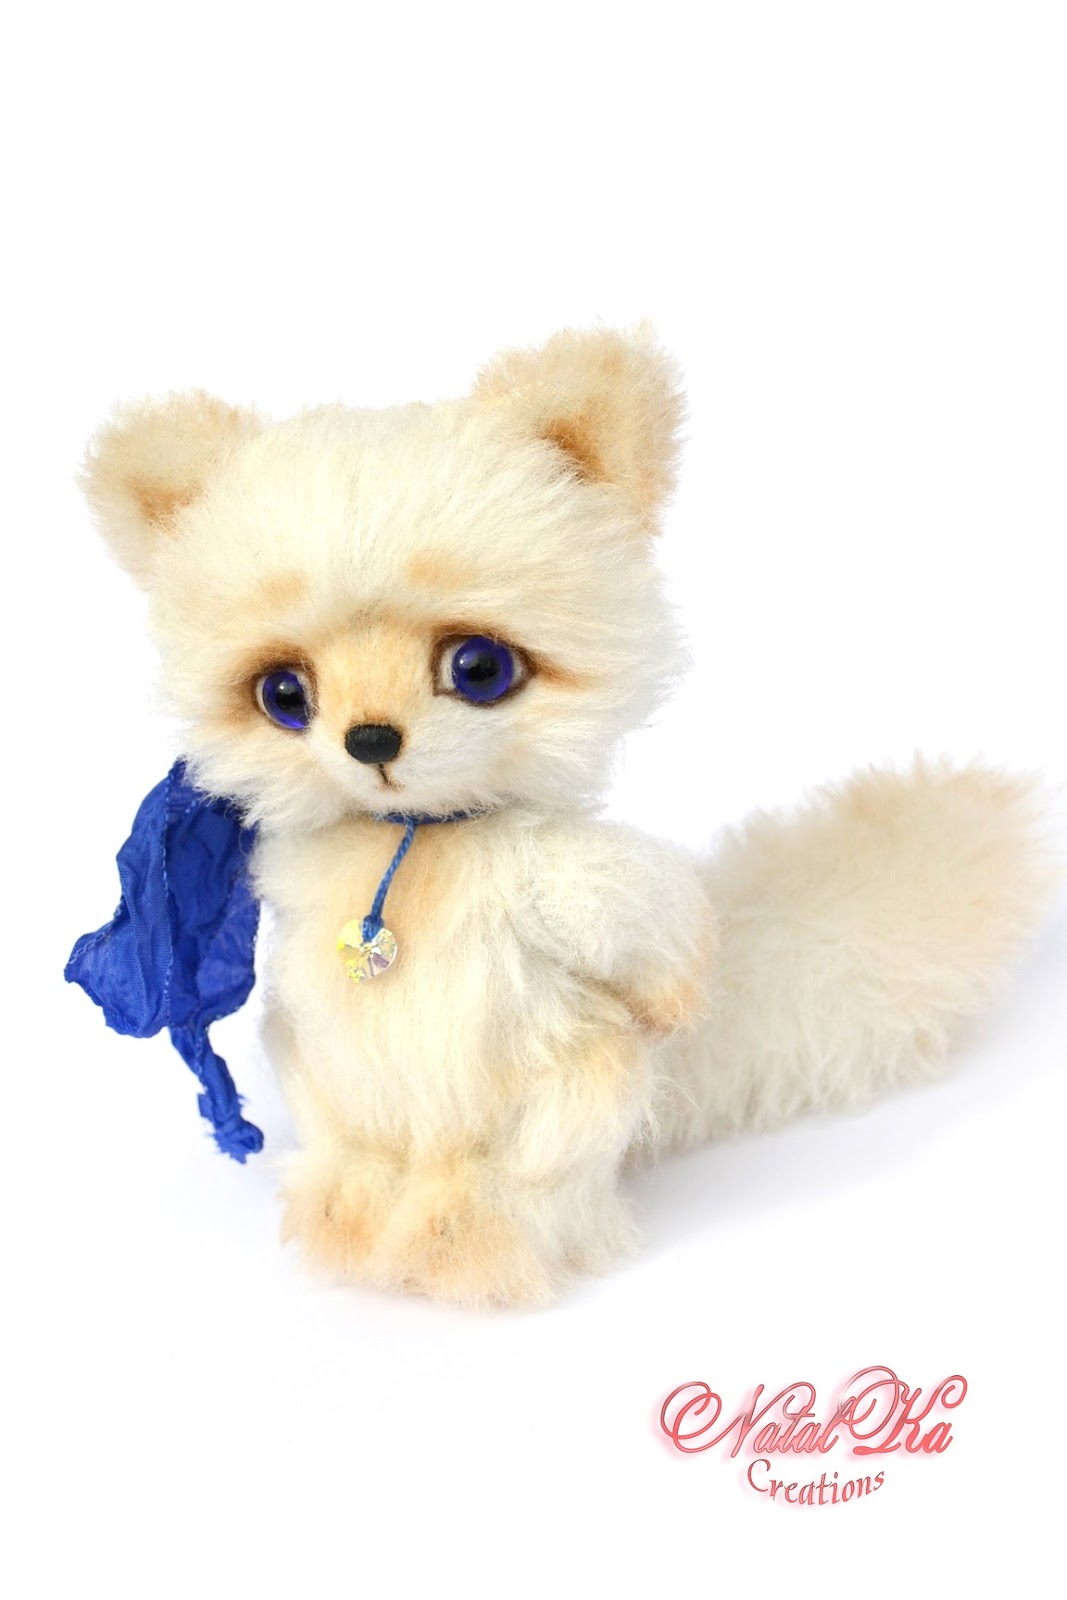 Artist teddy fox, fox, teddies, arctic fox, teddy jointed, Künstlerfuchs, Polarfuchs, Künstlerteddys, handmade by NatalKa Creations